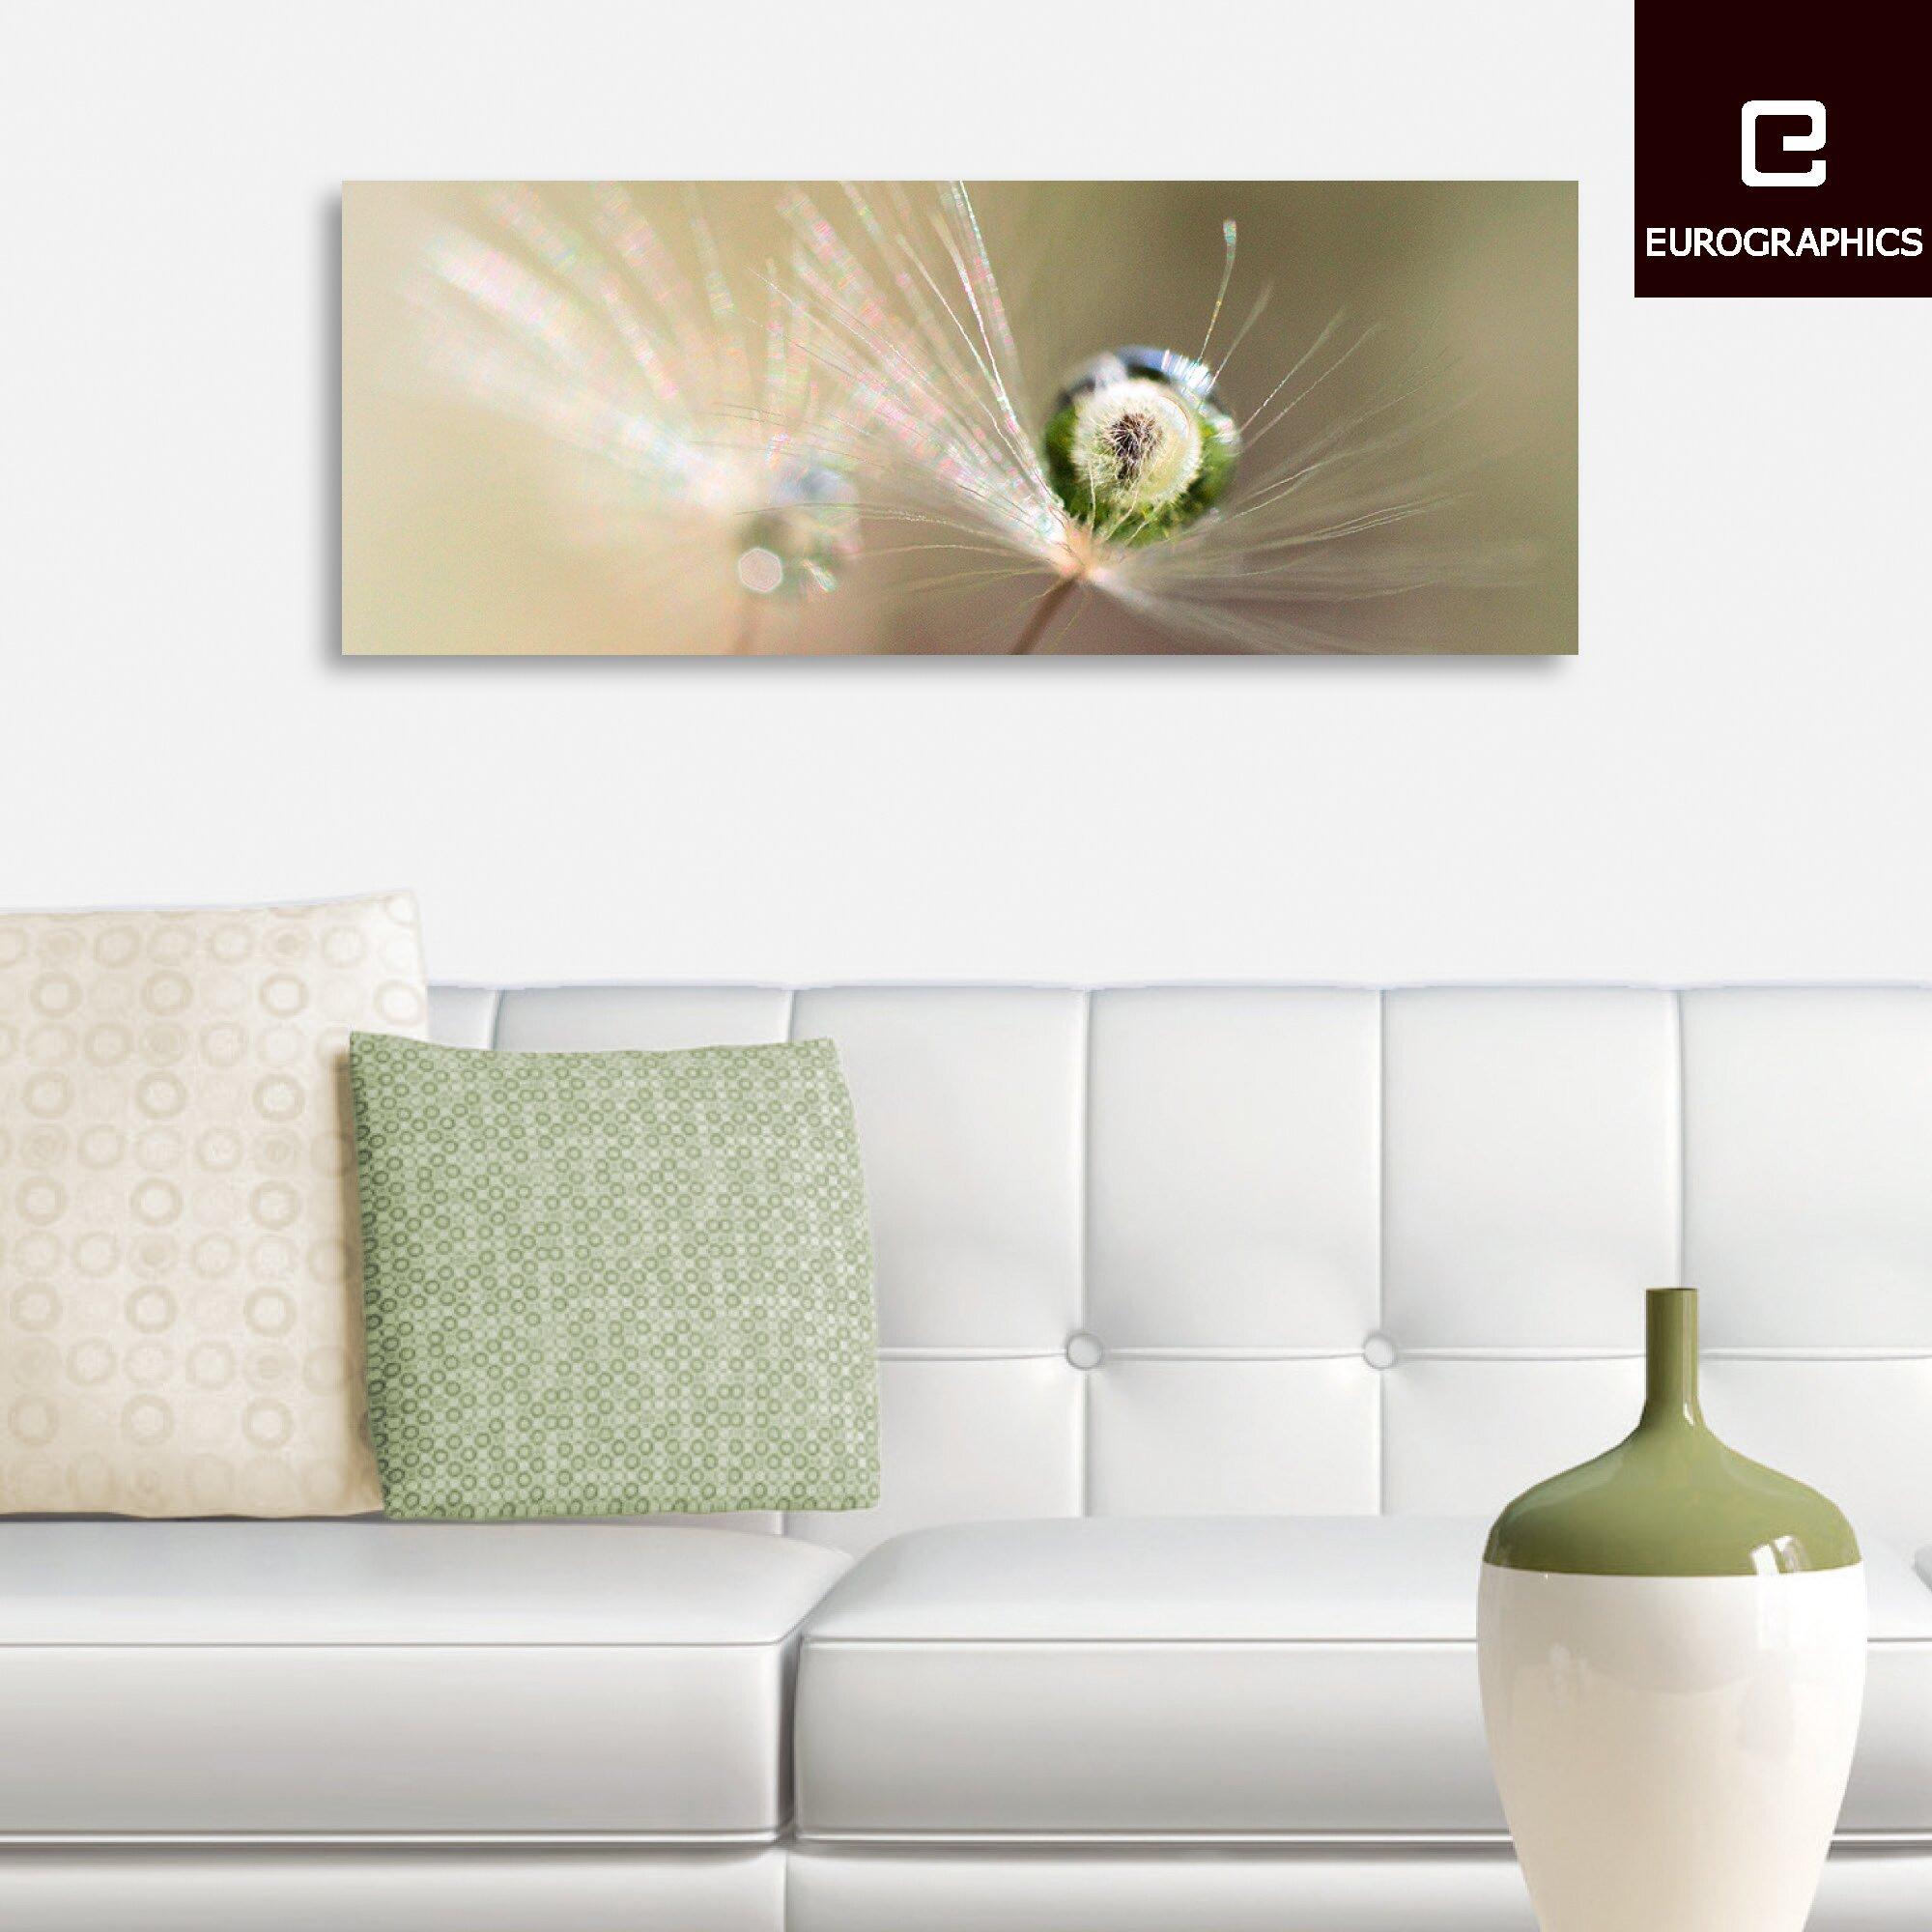 Glass Star Wall Decor : Eurographics star of dandelion by kulik bertrand